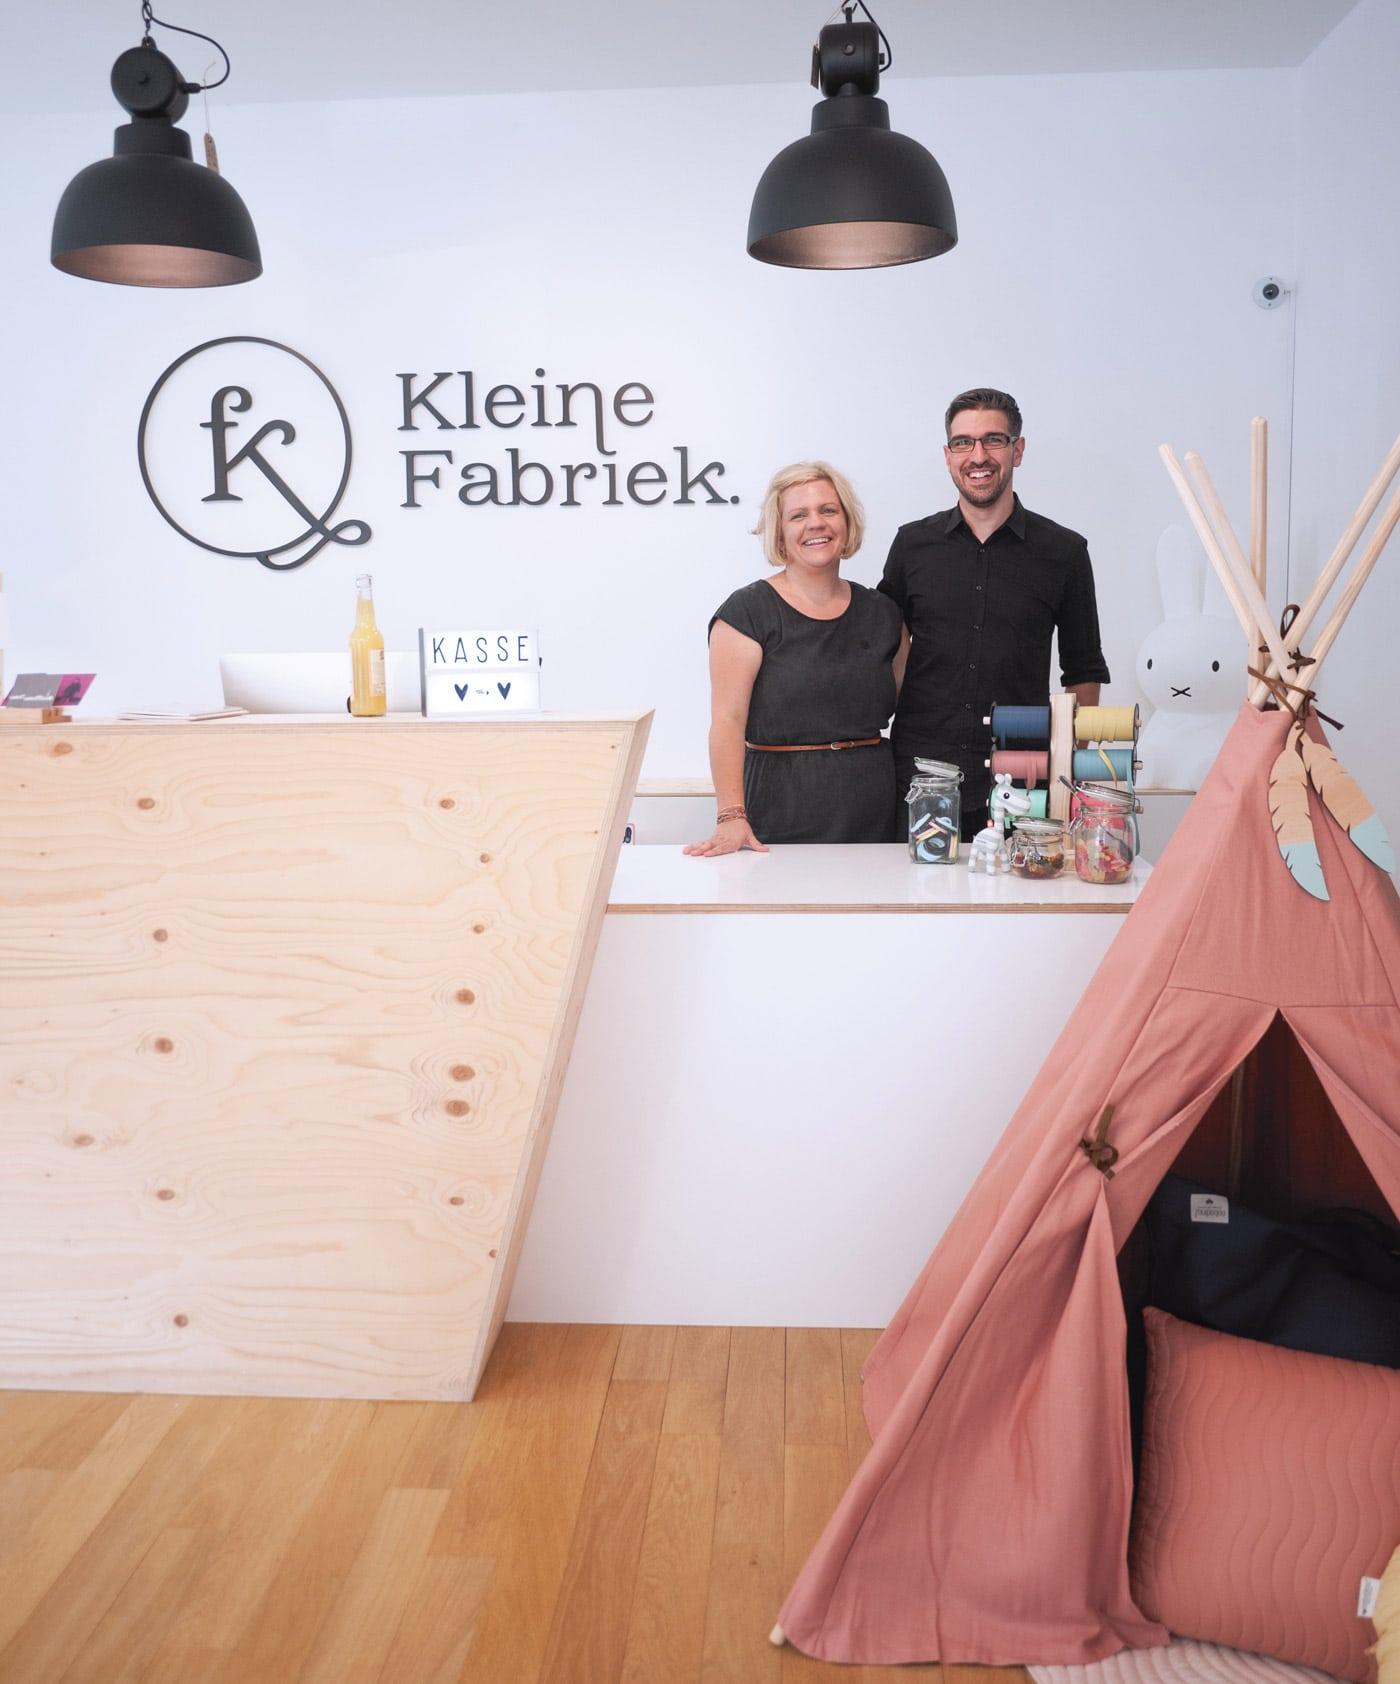 Berliner Läden mit Onlineshop: Kleine Fabriek // HIMBEER